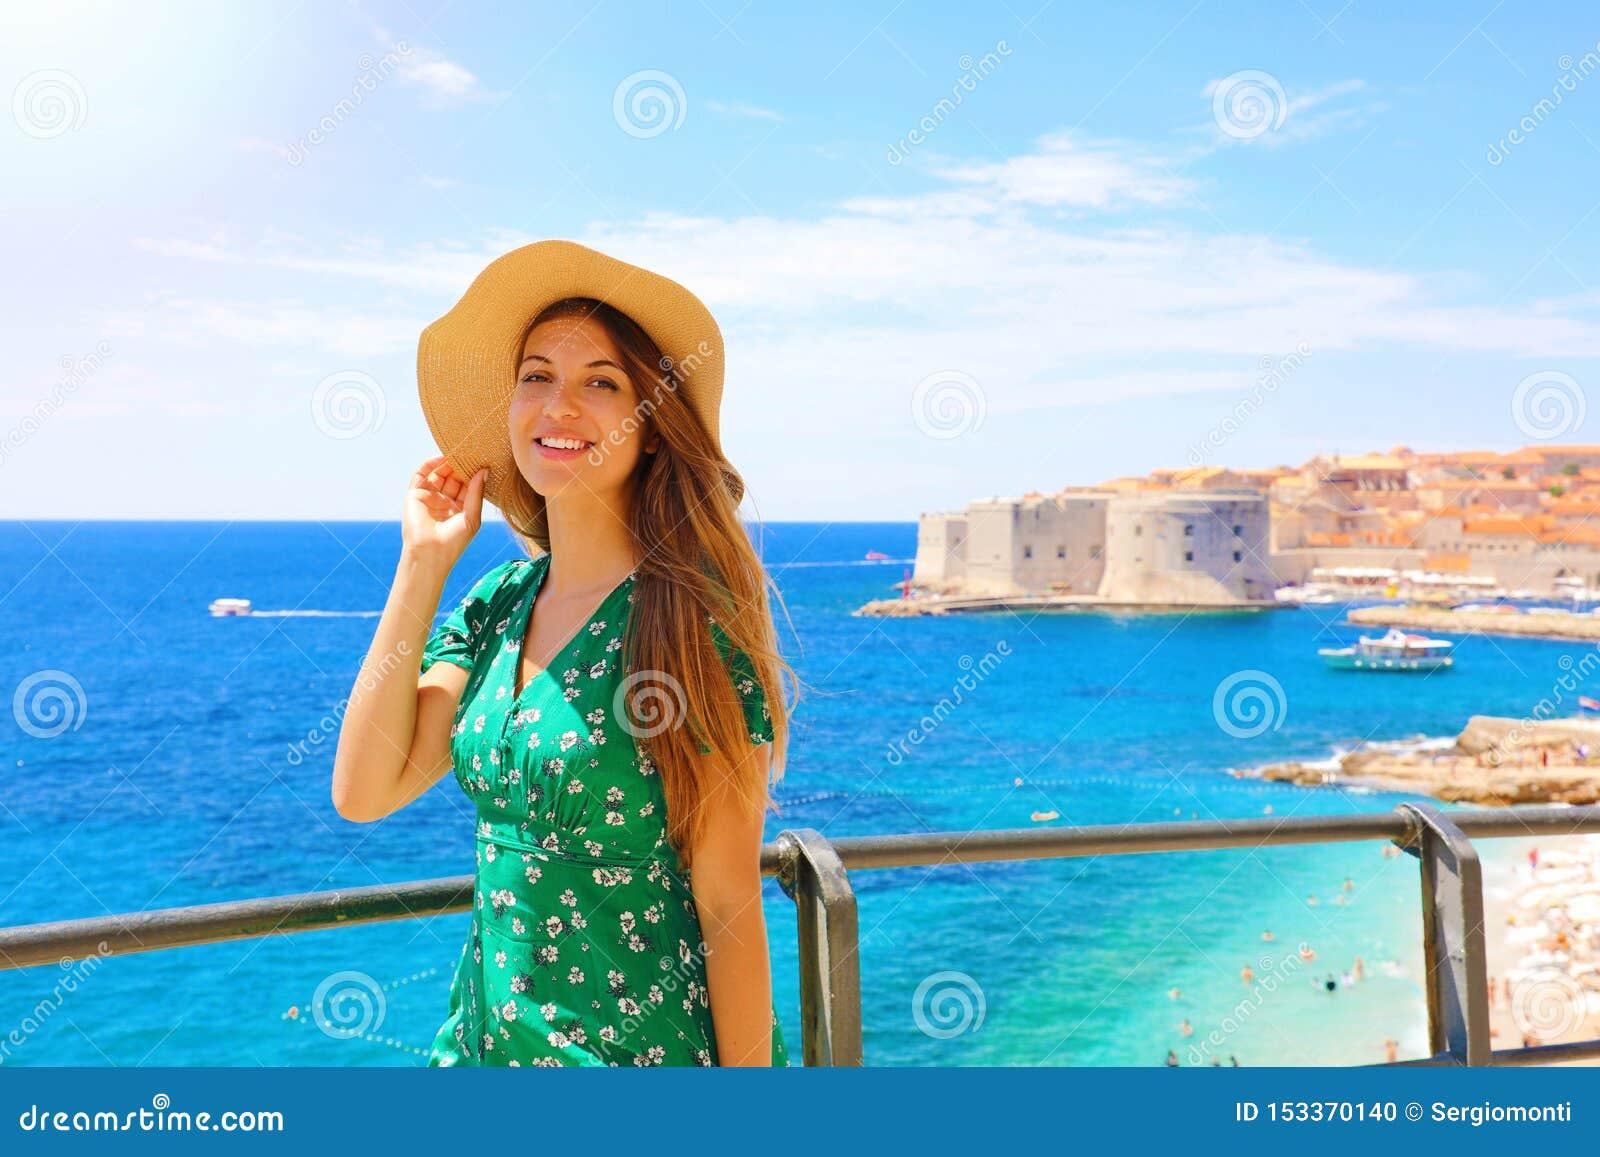 Happy beautiful woman enjoying her cruise in Mediterranean Sea. Smiling traveler girl enjoying her summer holidays in Dubrovnik,